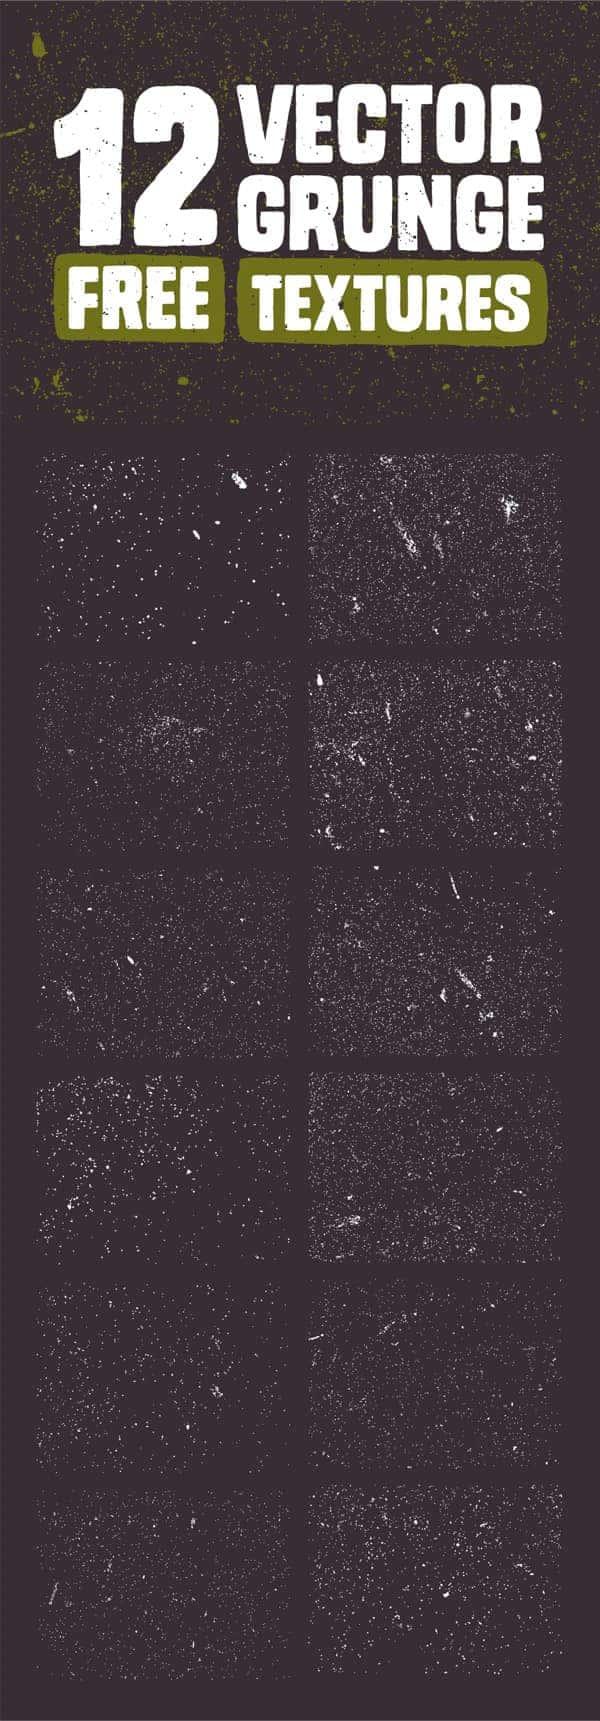 vector-grunge-texture